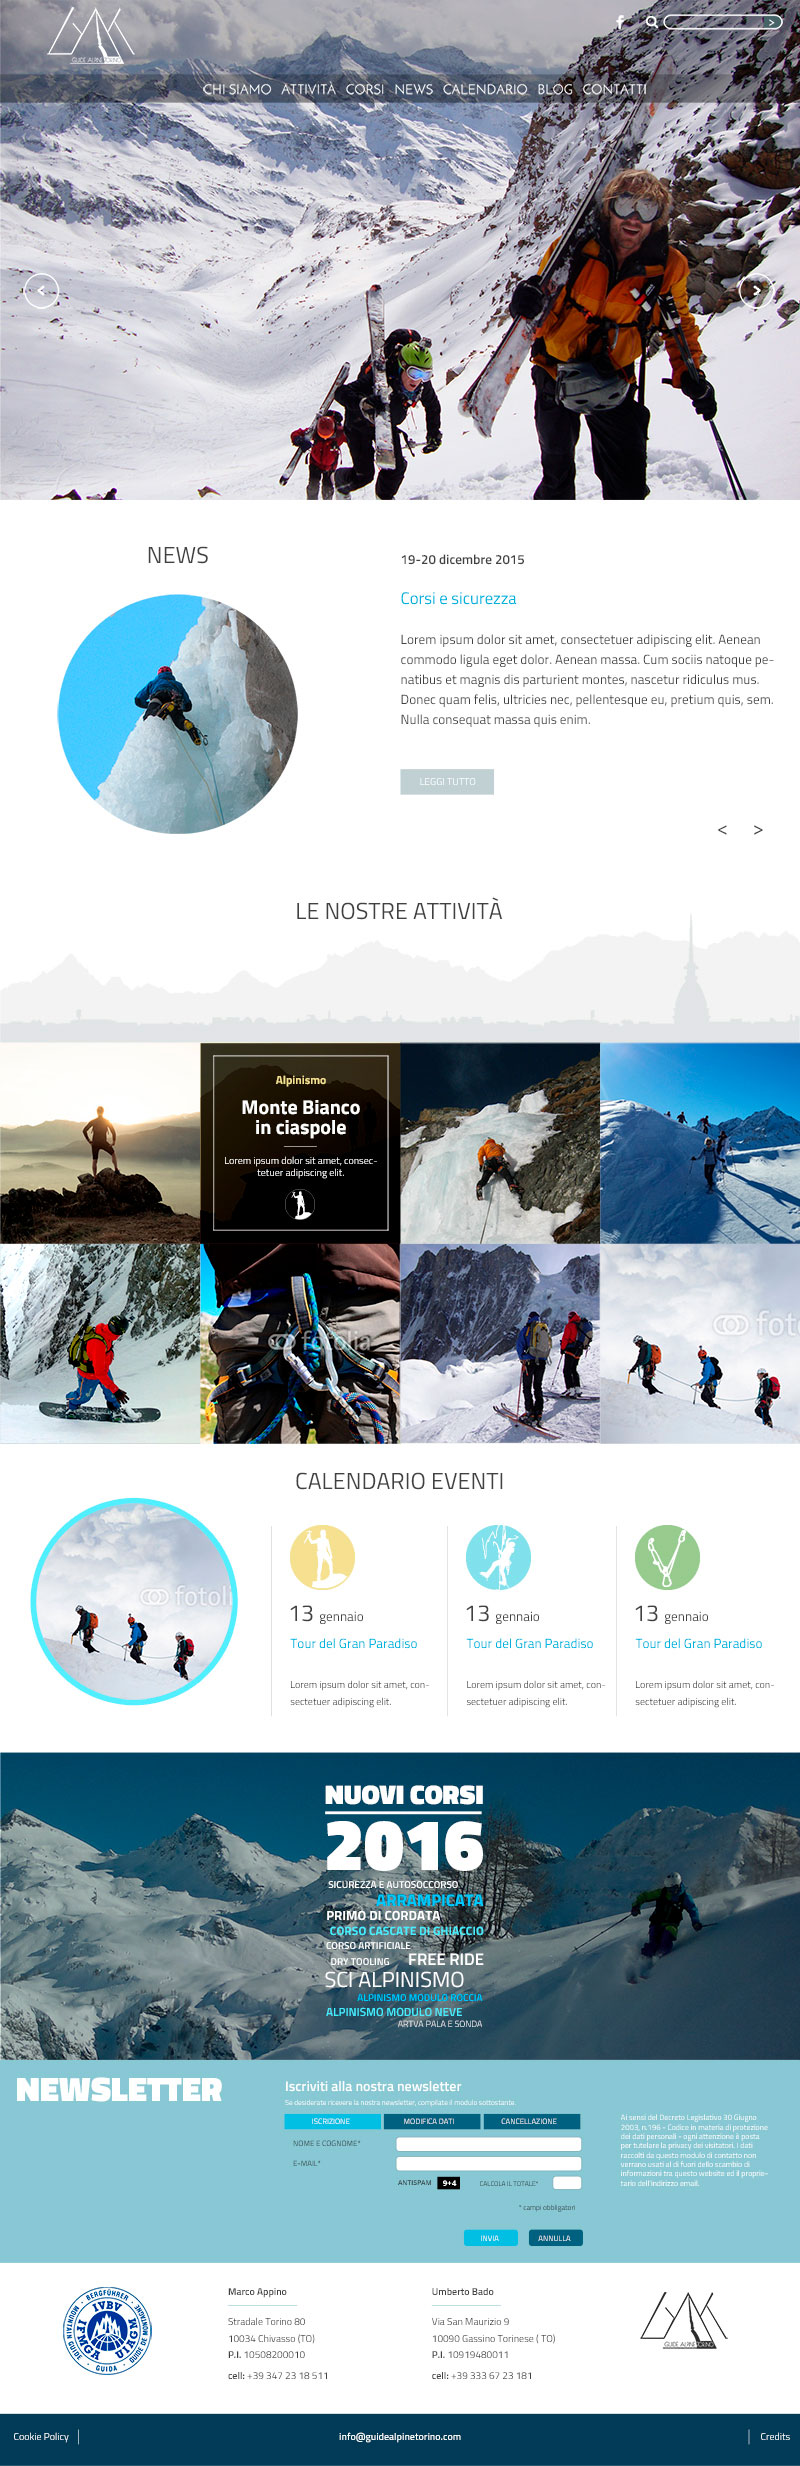 https://maxmaraucci.it/wp-content/uploads/2020/08/GAT_GuideAlpineTorino_layout_Homepage-1.jpg